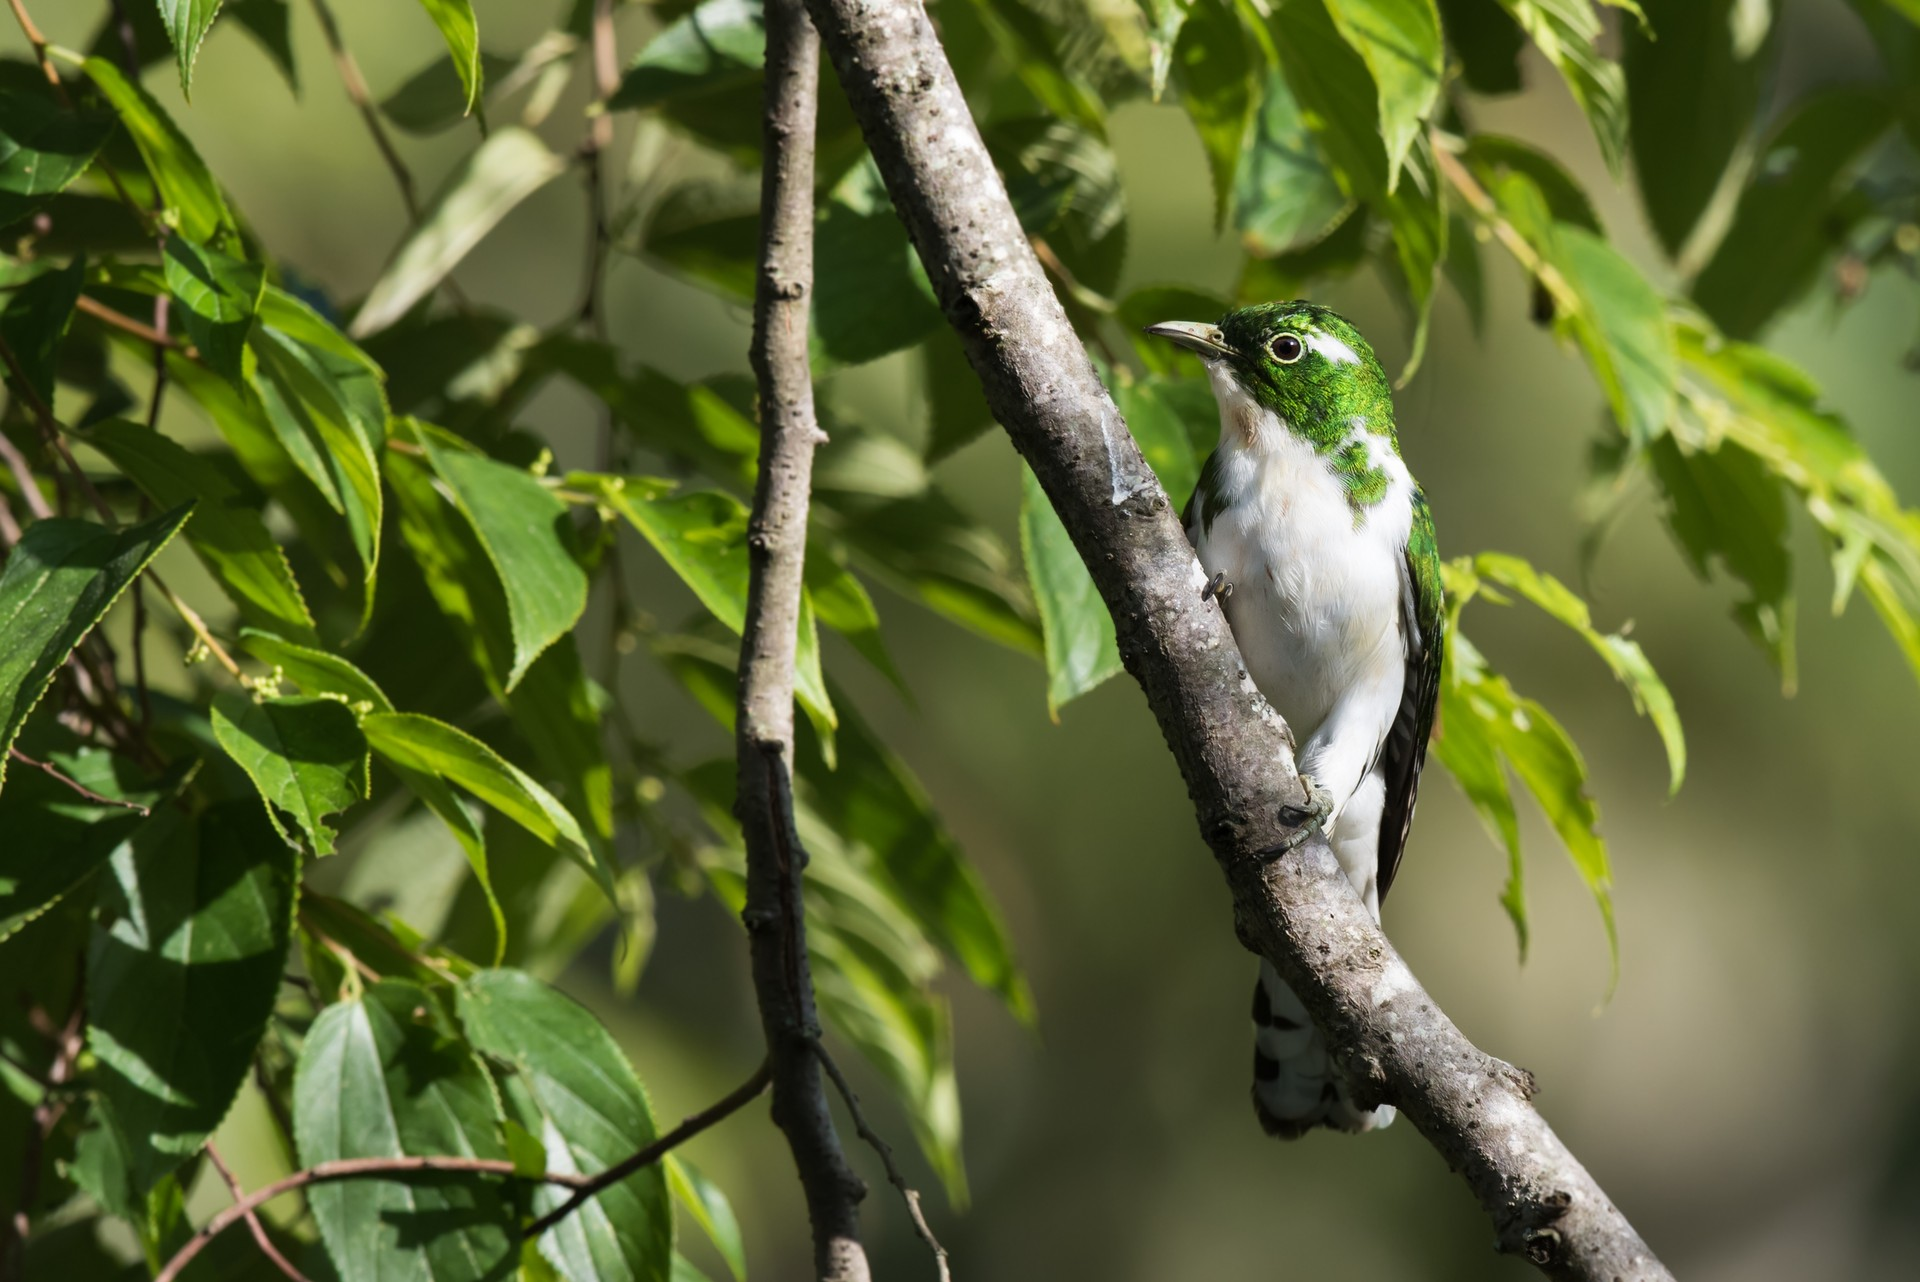 Klass's Cuckoo found in Oserengoni wildlife sanctuary